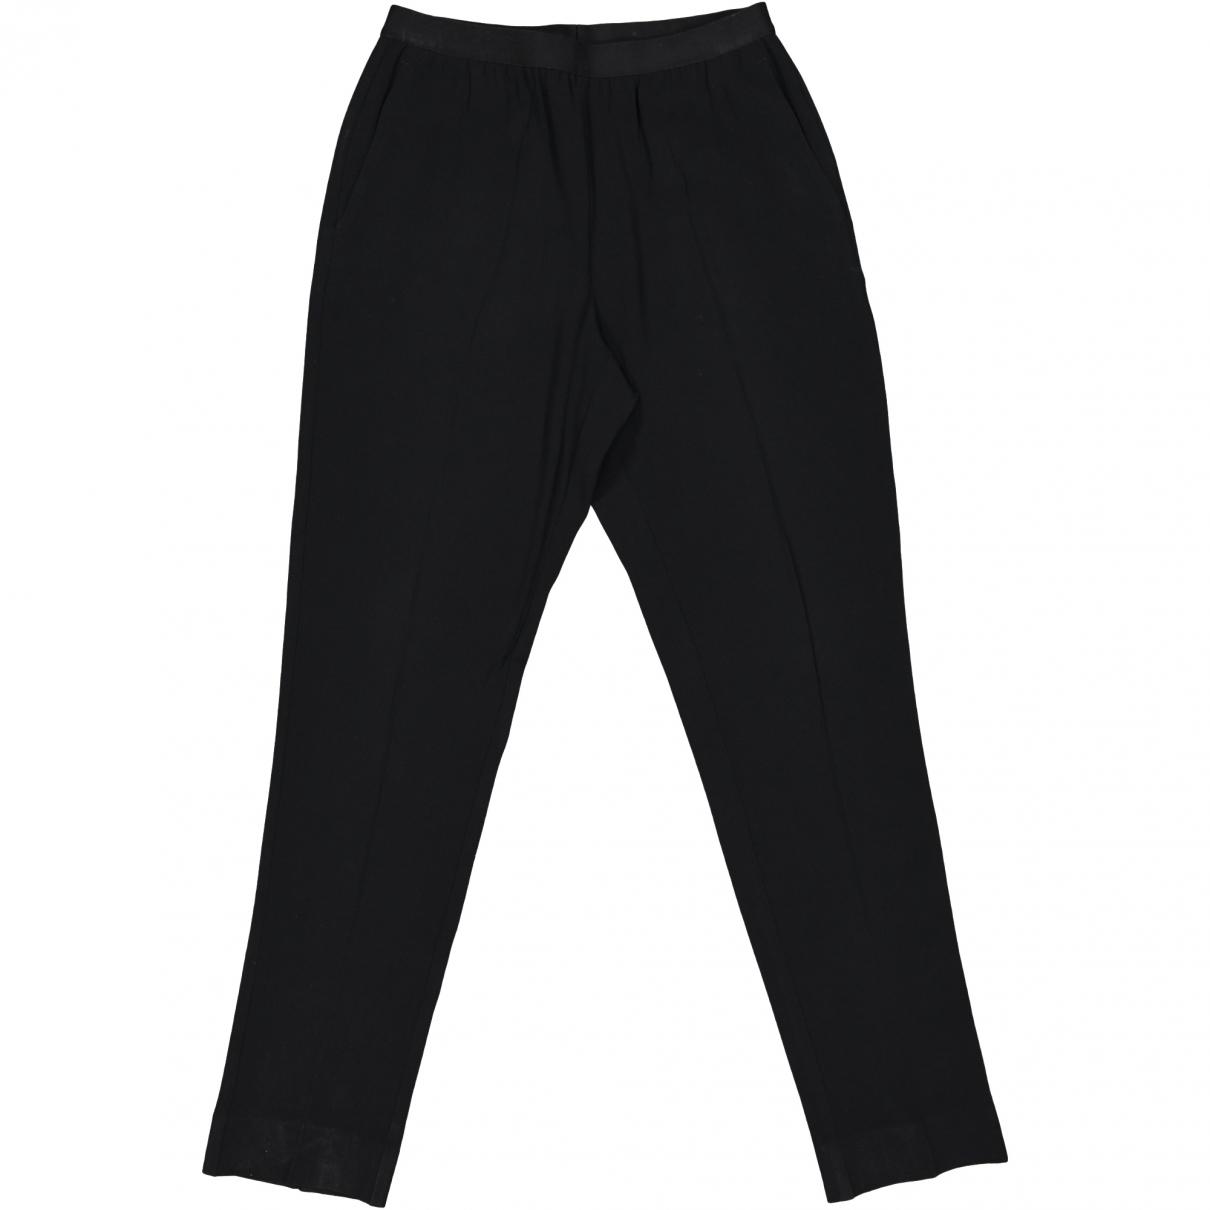 Maison Martin Margiela \N Black Trousers for Women 44 IT